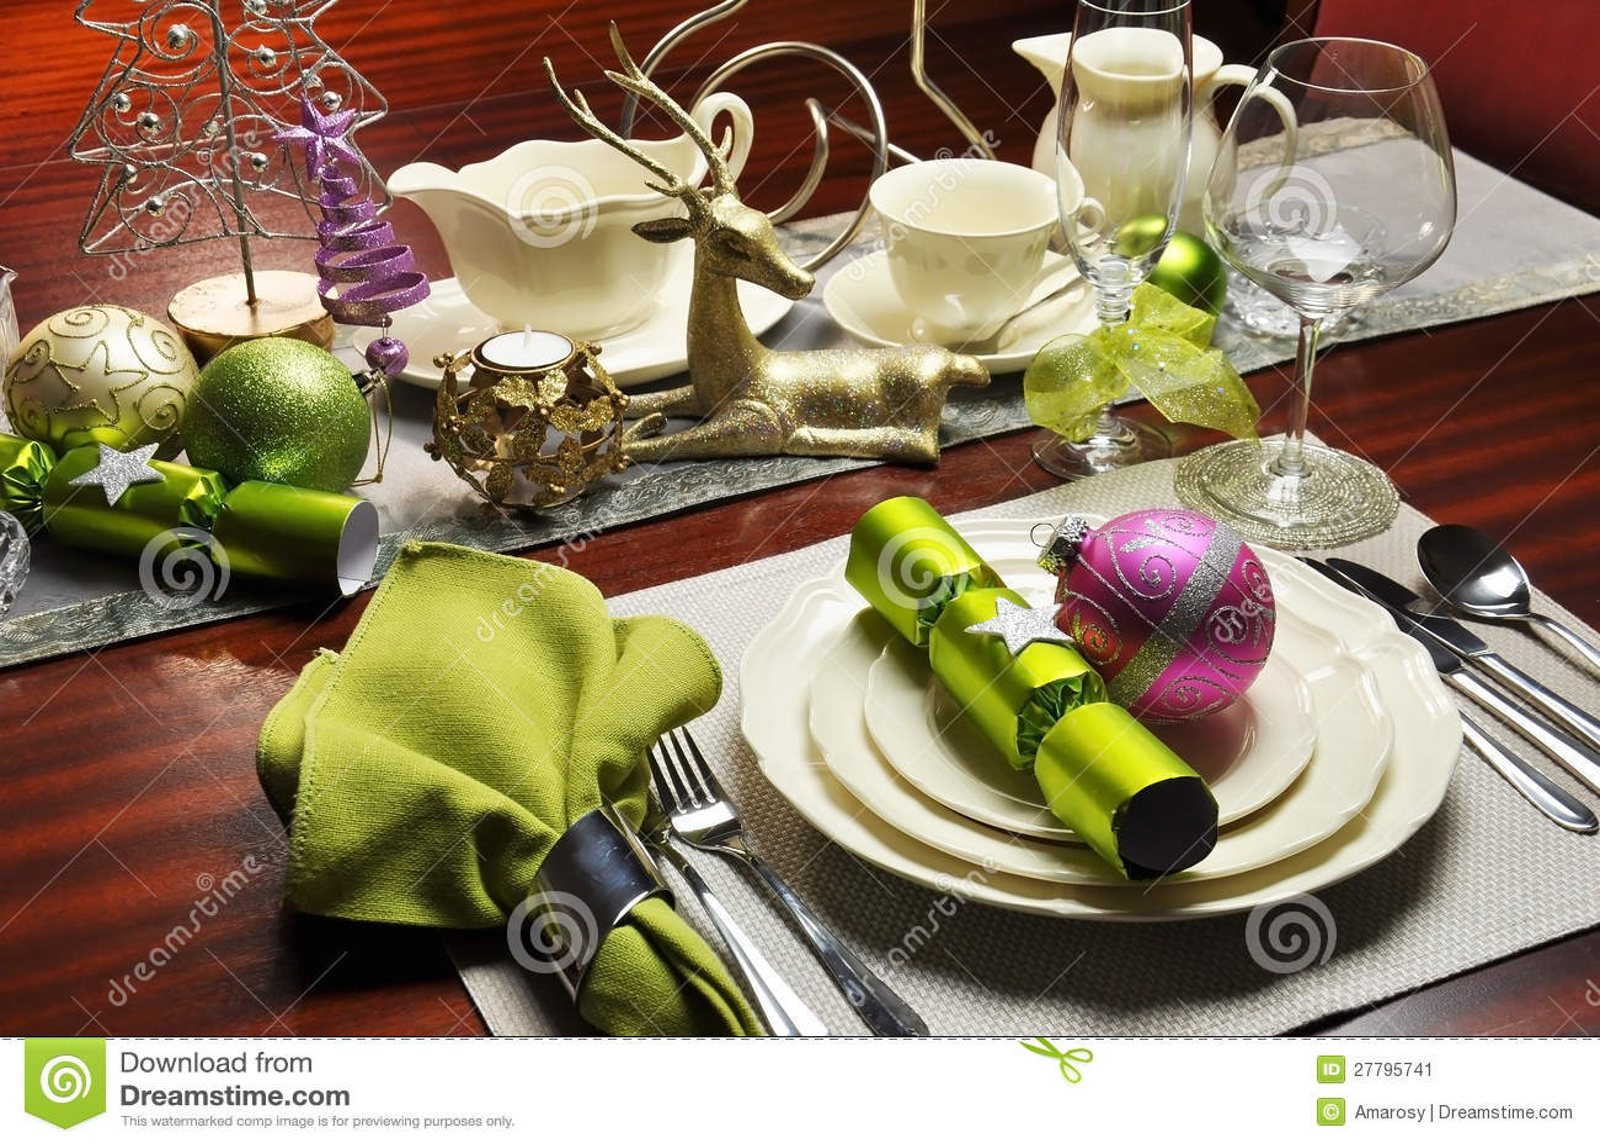 stylish christmas eve dinner table setting stock image